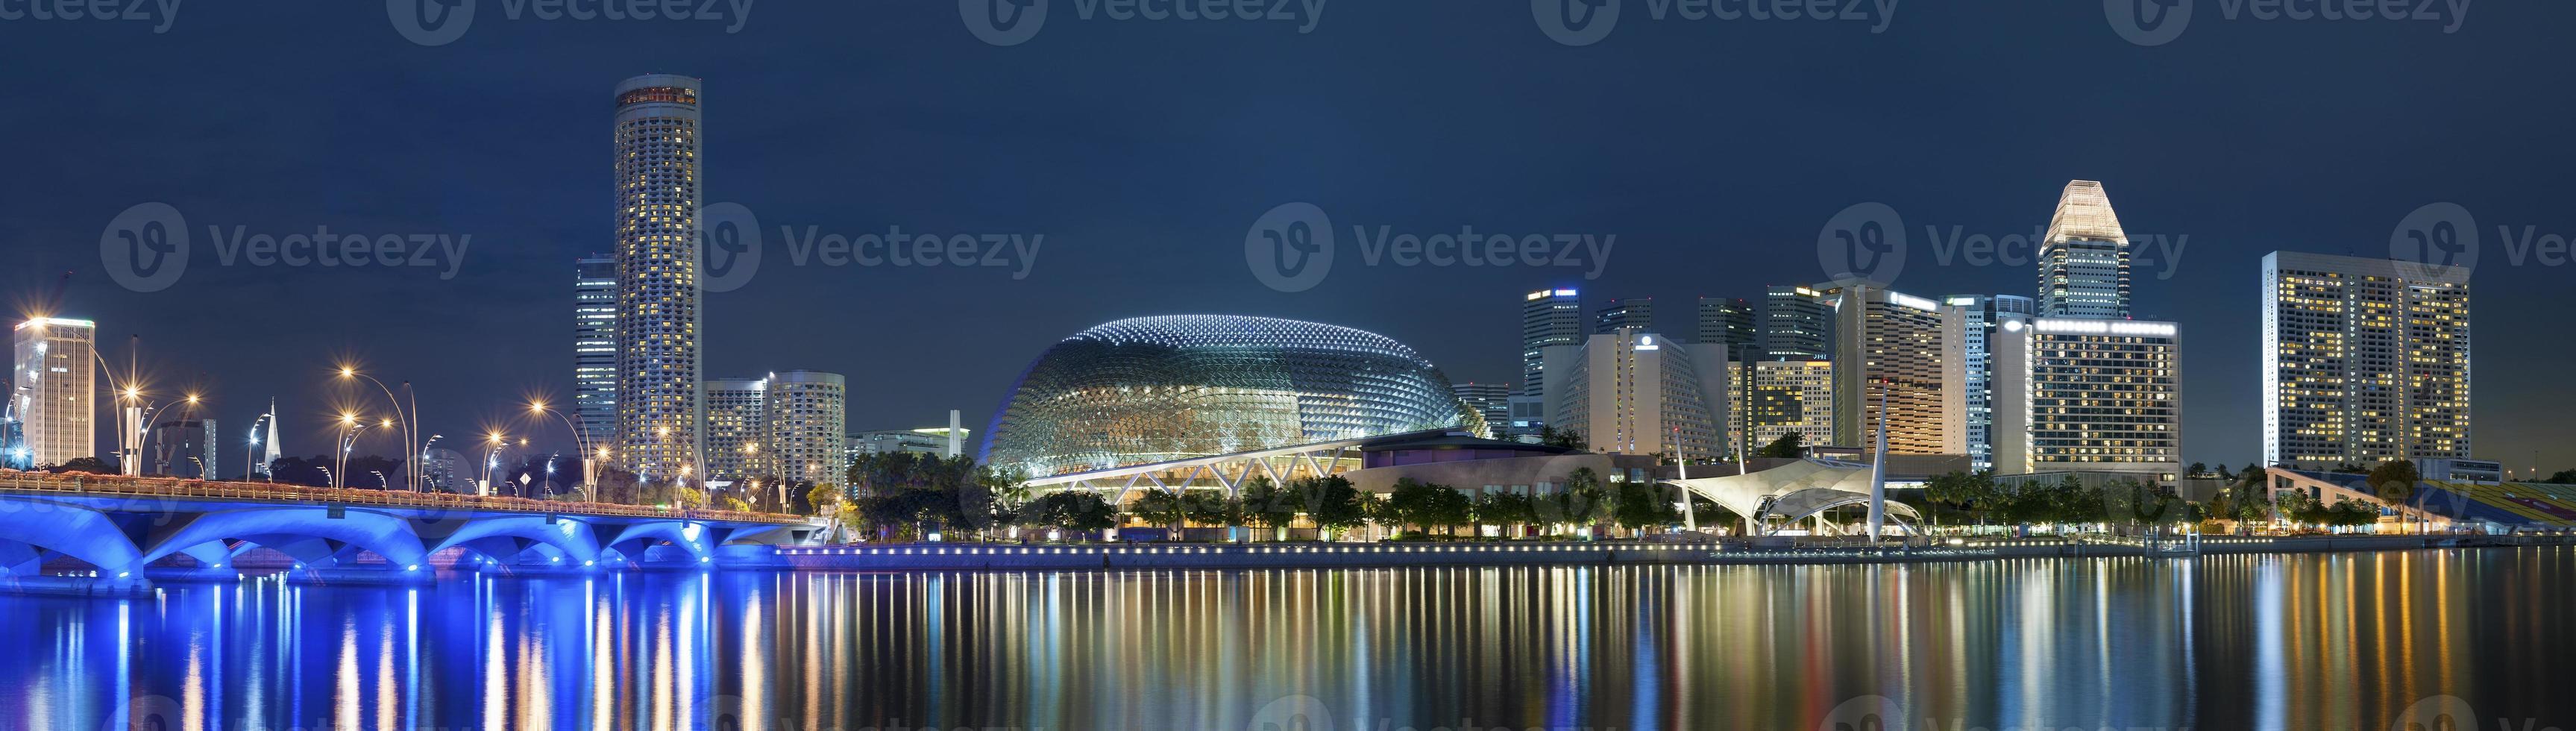 paisaje urbano de singapur foto